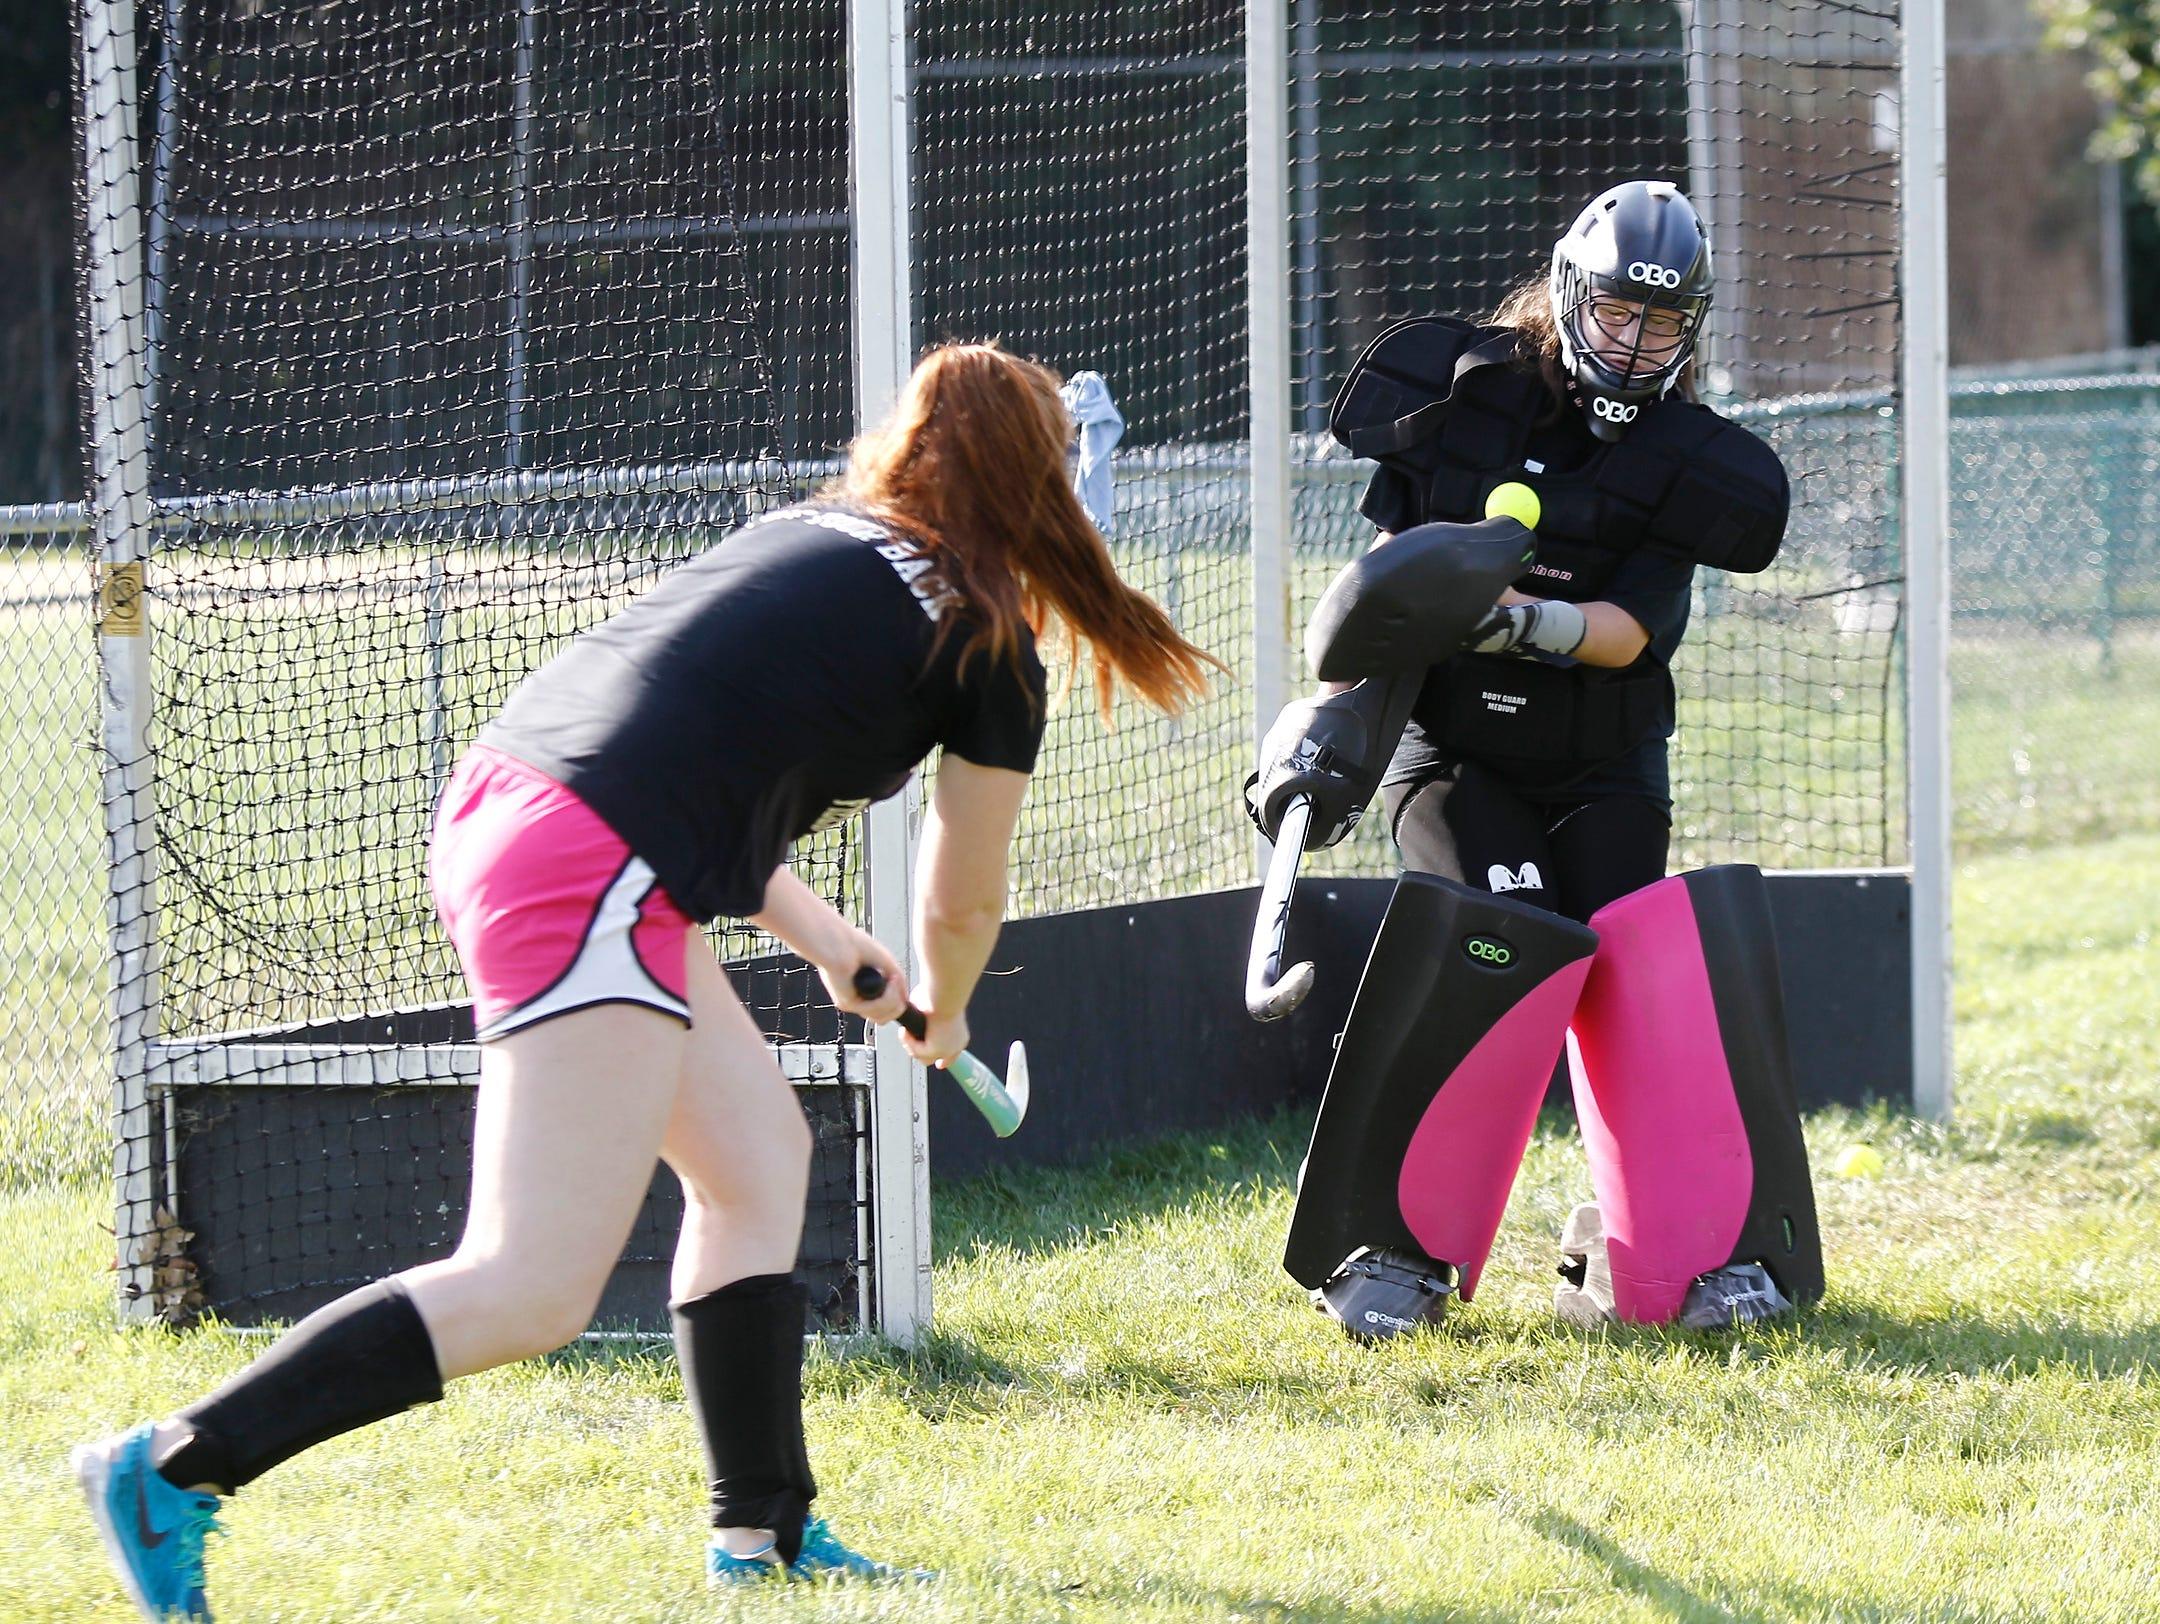 Nanuet goalie Jenn Franchino makes a save during field hockey practice at Nanuet High School in Nanuet on Thursday, August 25, 2016.